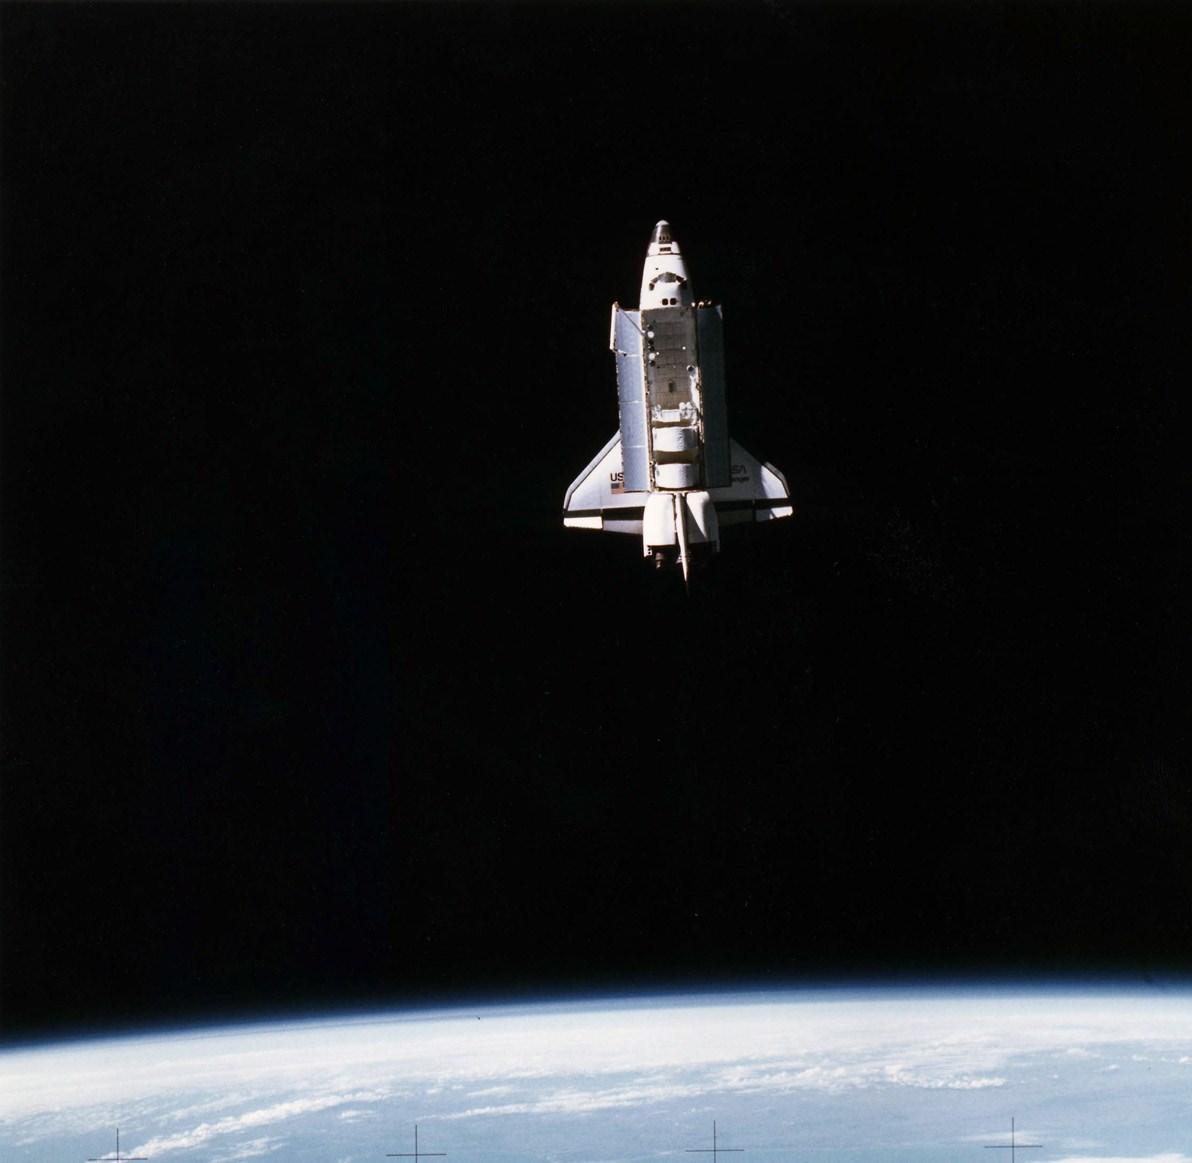 future space shuttle in orbit - photo #47